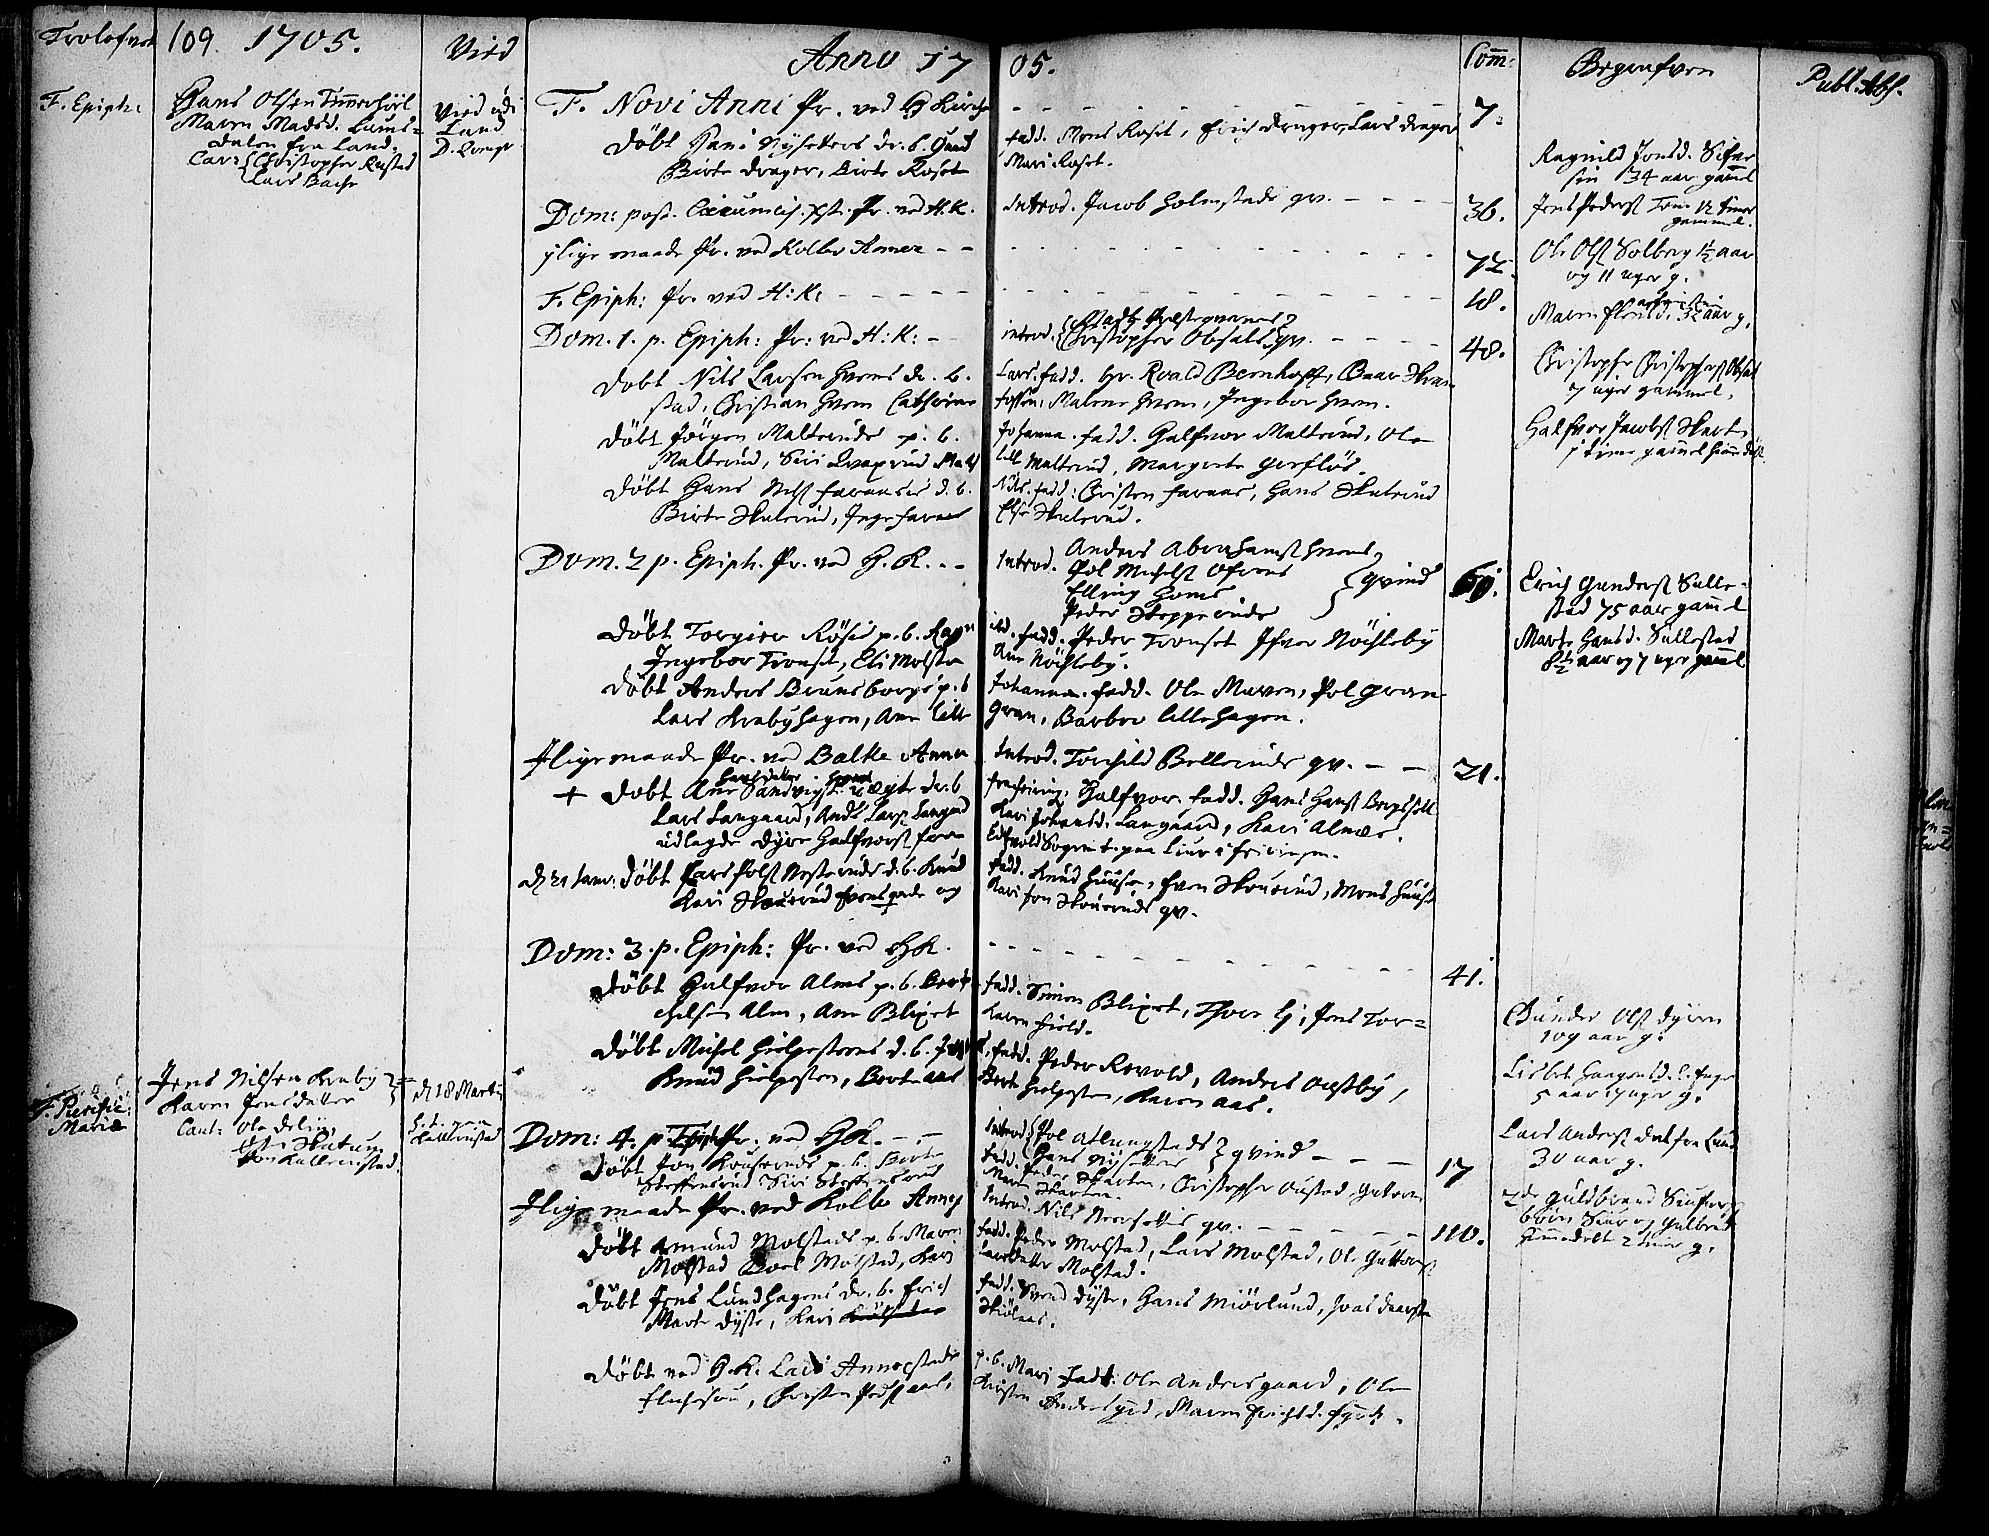 SAH, Toten prestekontor, Ministerialbok nr. 1, 1695-1713, s. 109